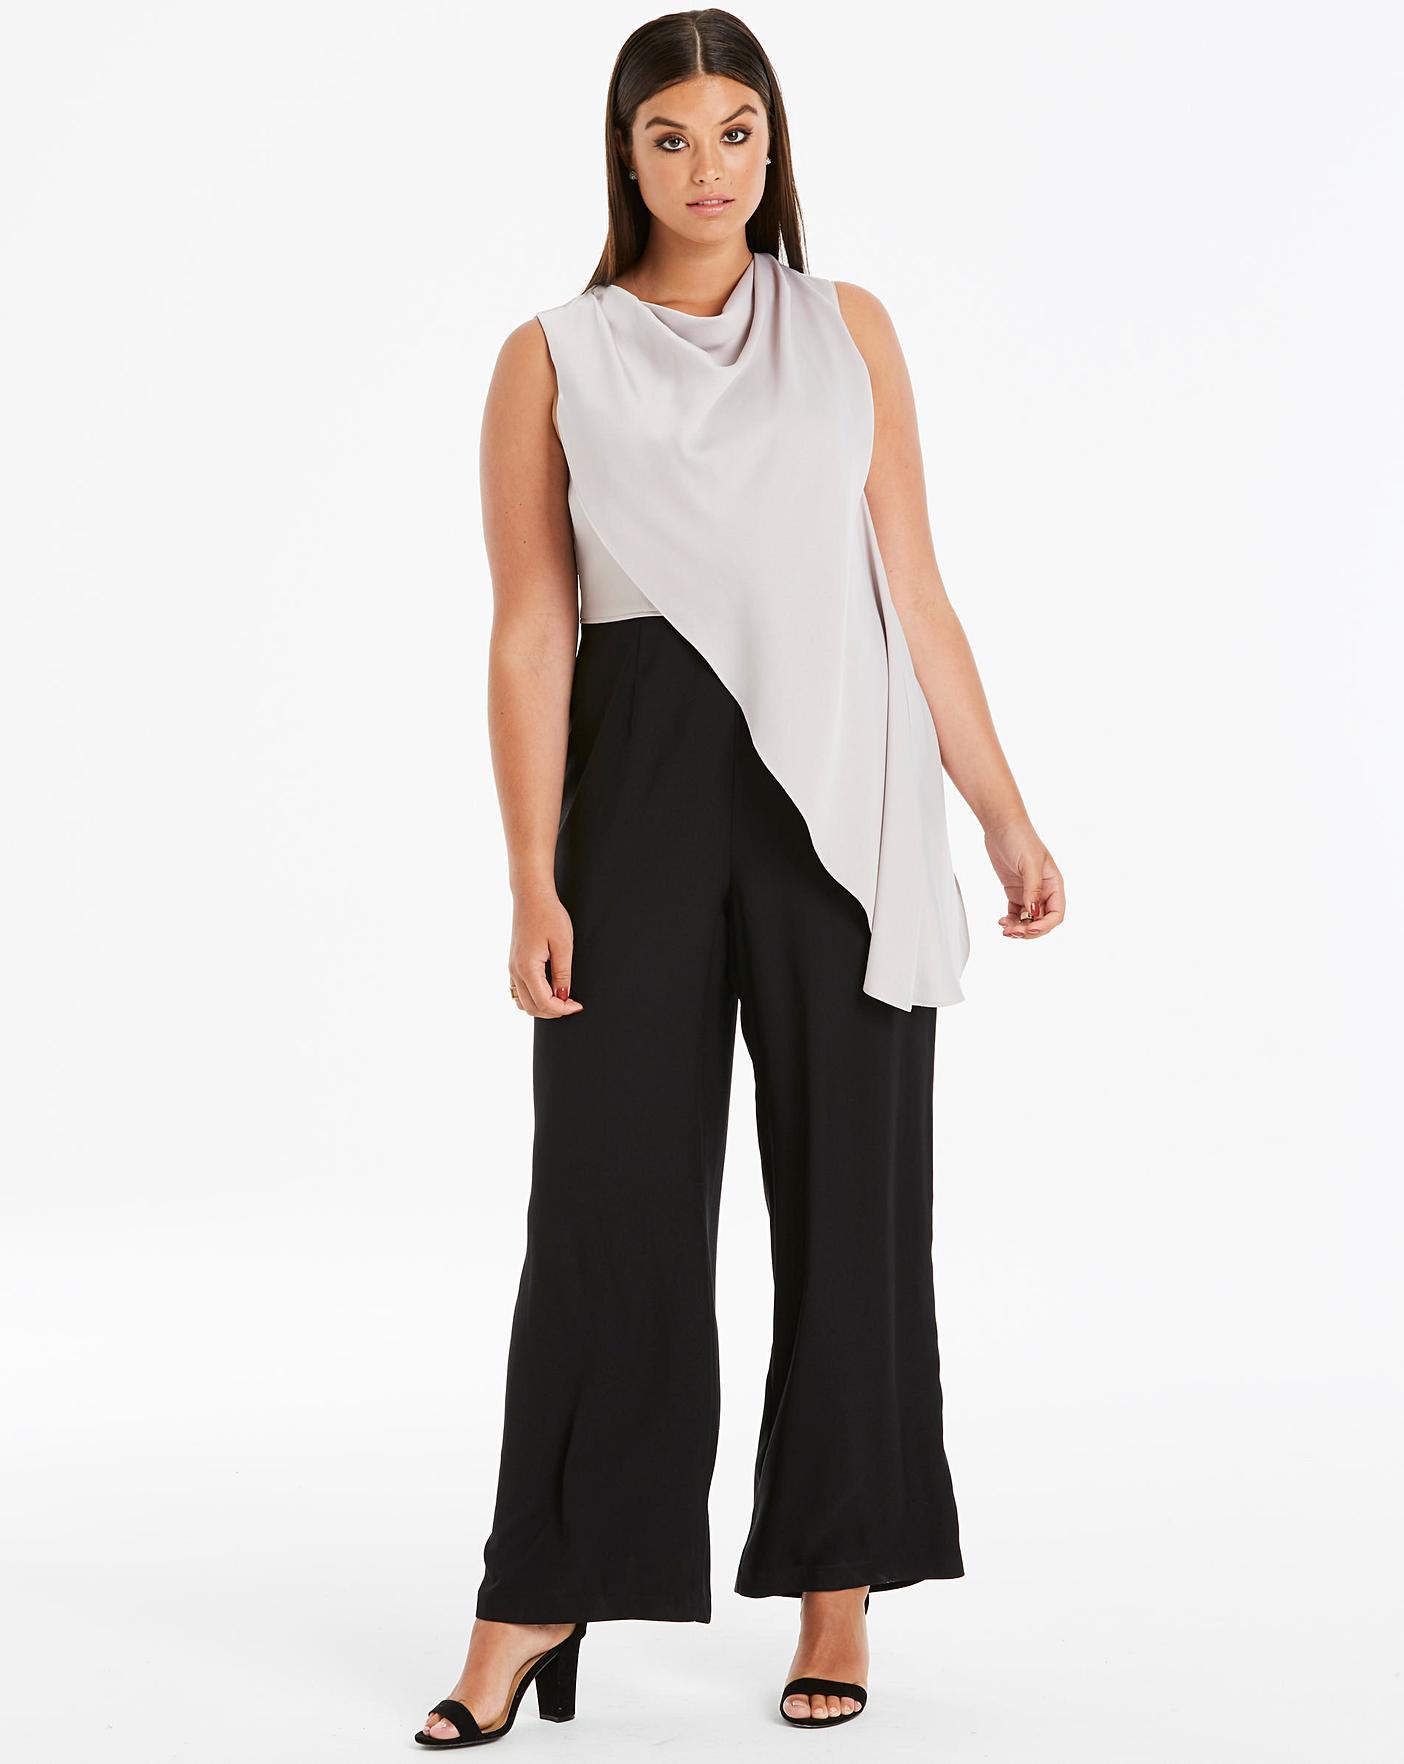 3789d12b140 Description. Cut a stylish silhouette in the Rosie Colourblock Jumpsuit  from Coast.